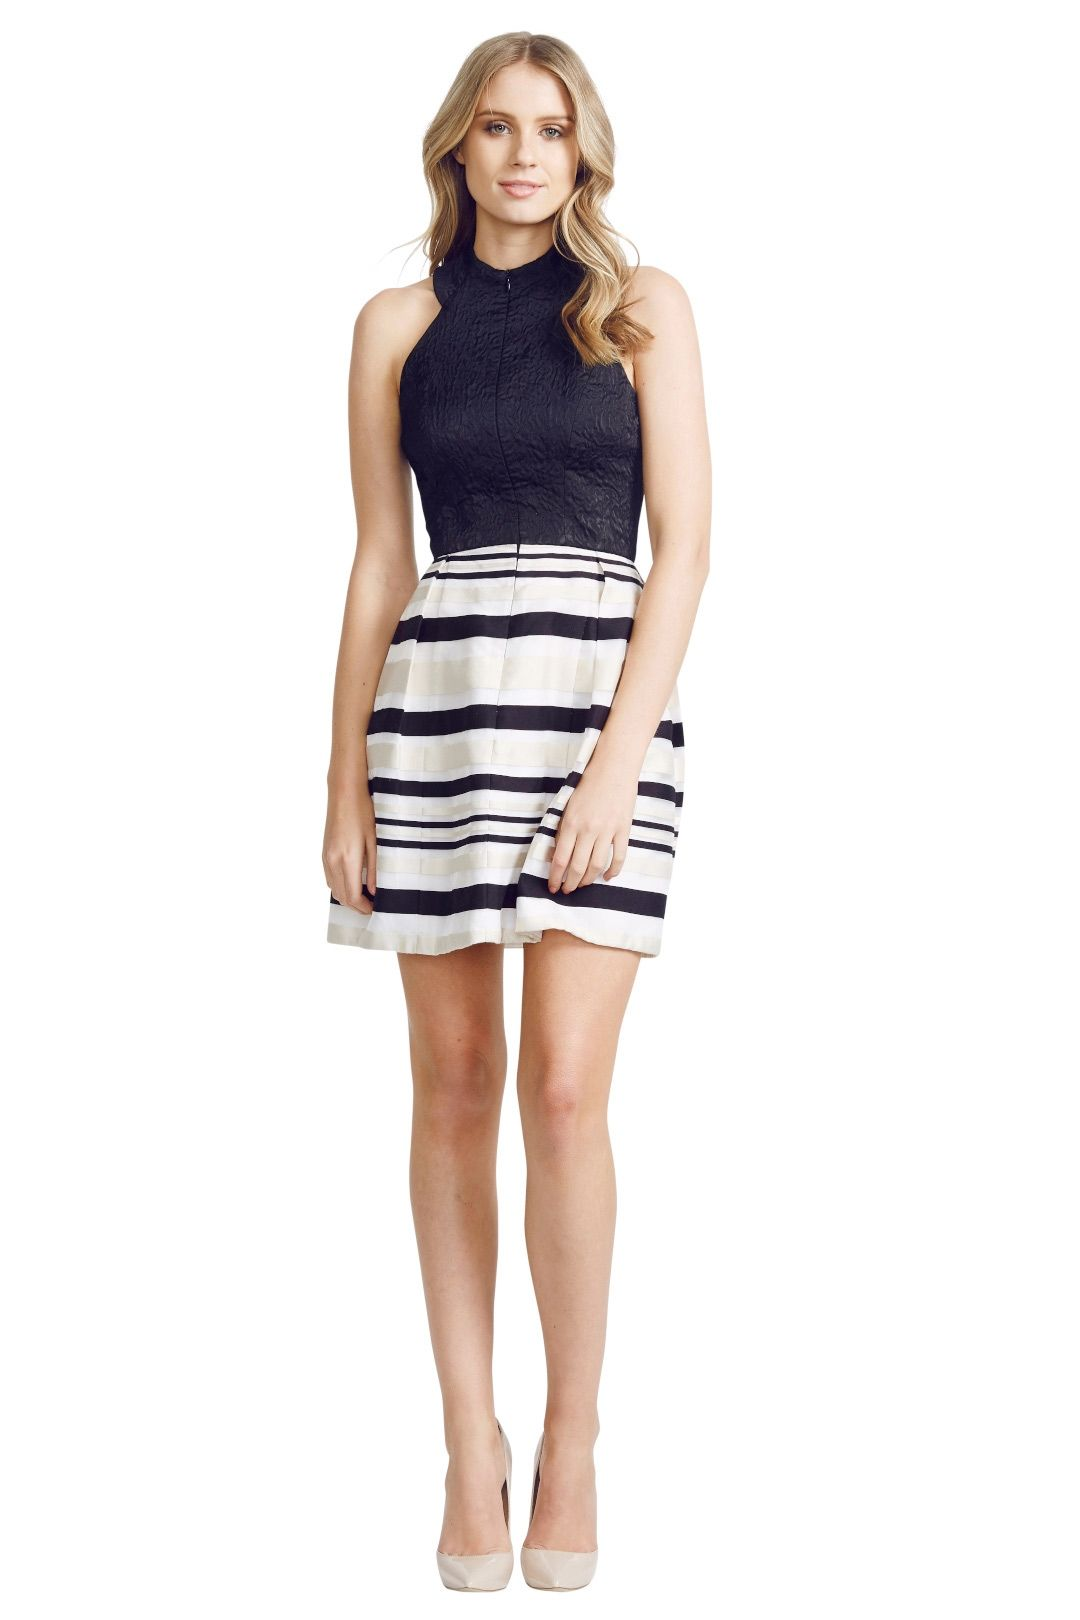 Nicola Finetti - Stripe Skirt Zip Front Dress - Black Print - Front